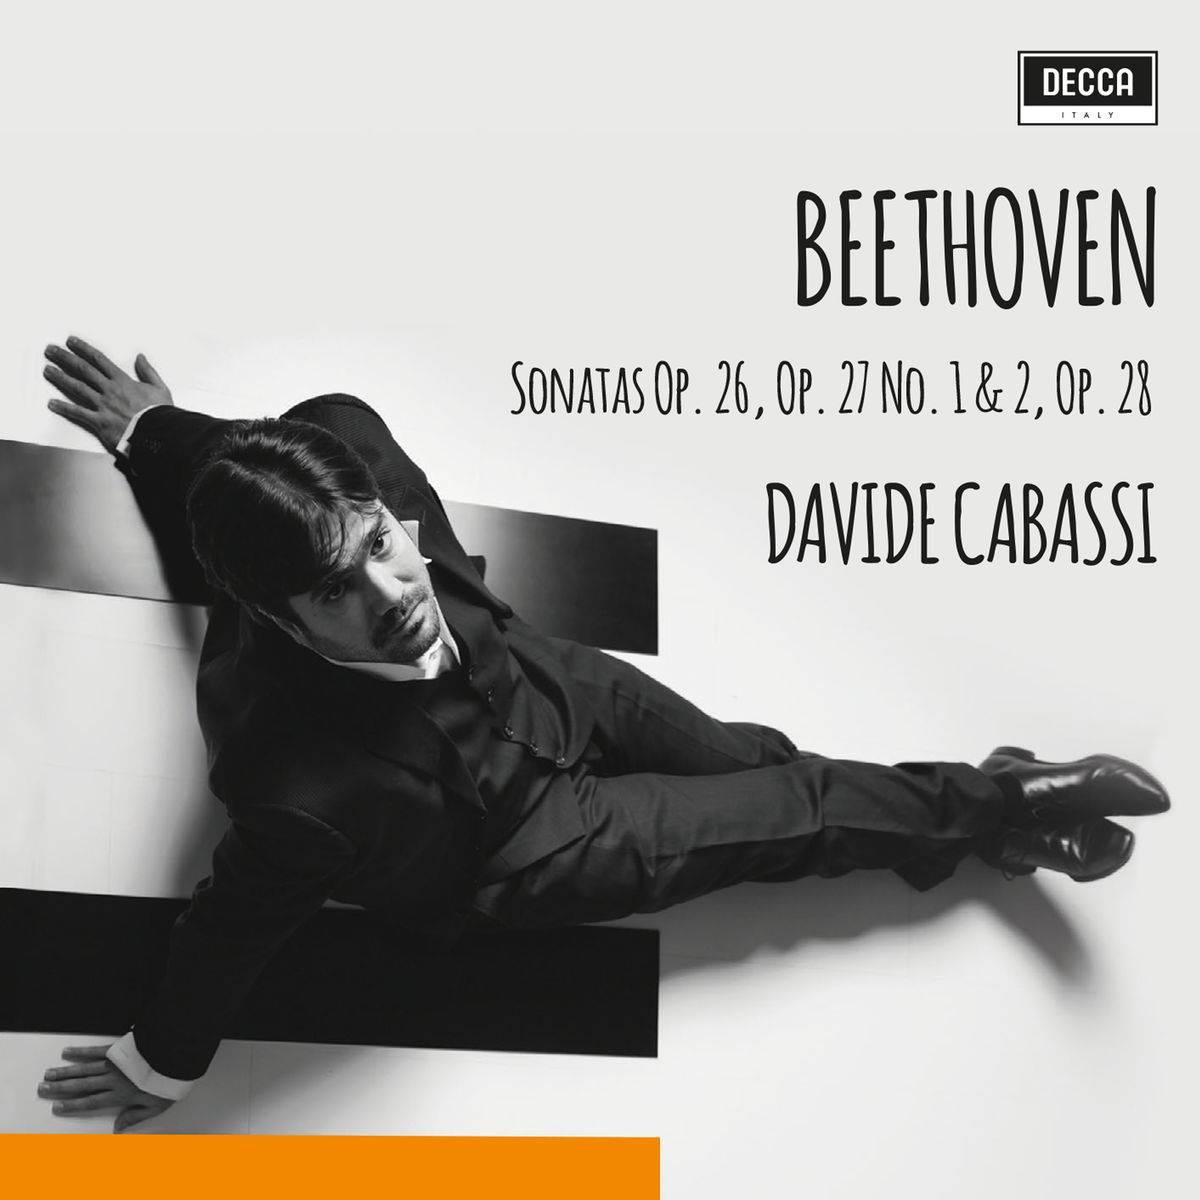 Davide Cabassi - Beethoven: Sonatas, Op. 26, 27 Nos 1 & 2, 28 (2018) [Official Digital Download 24/96]